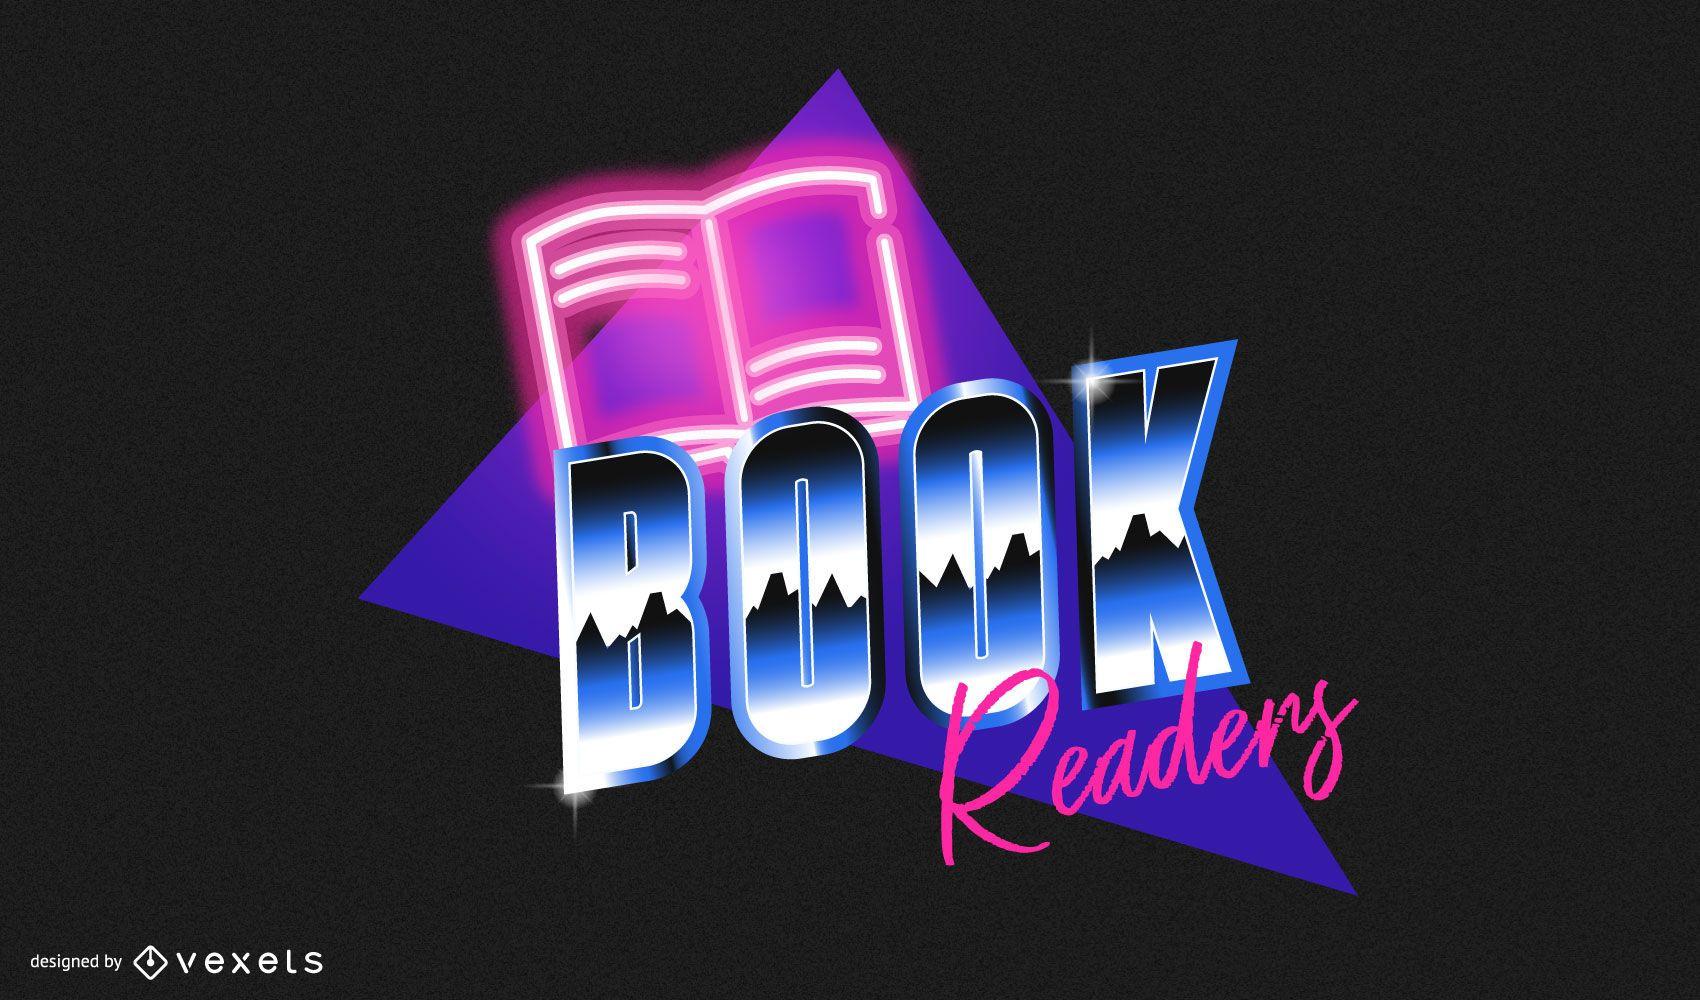 Retro book readers badge